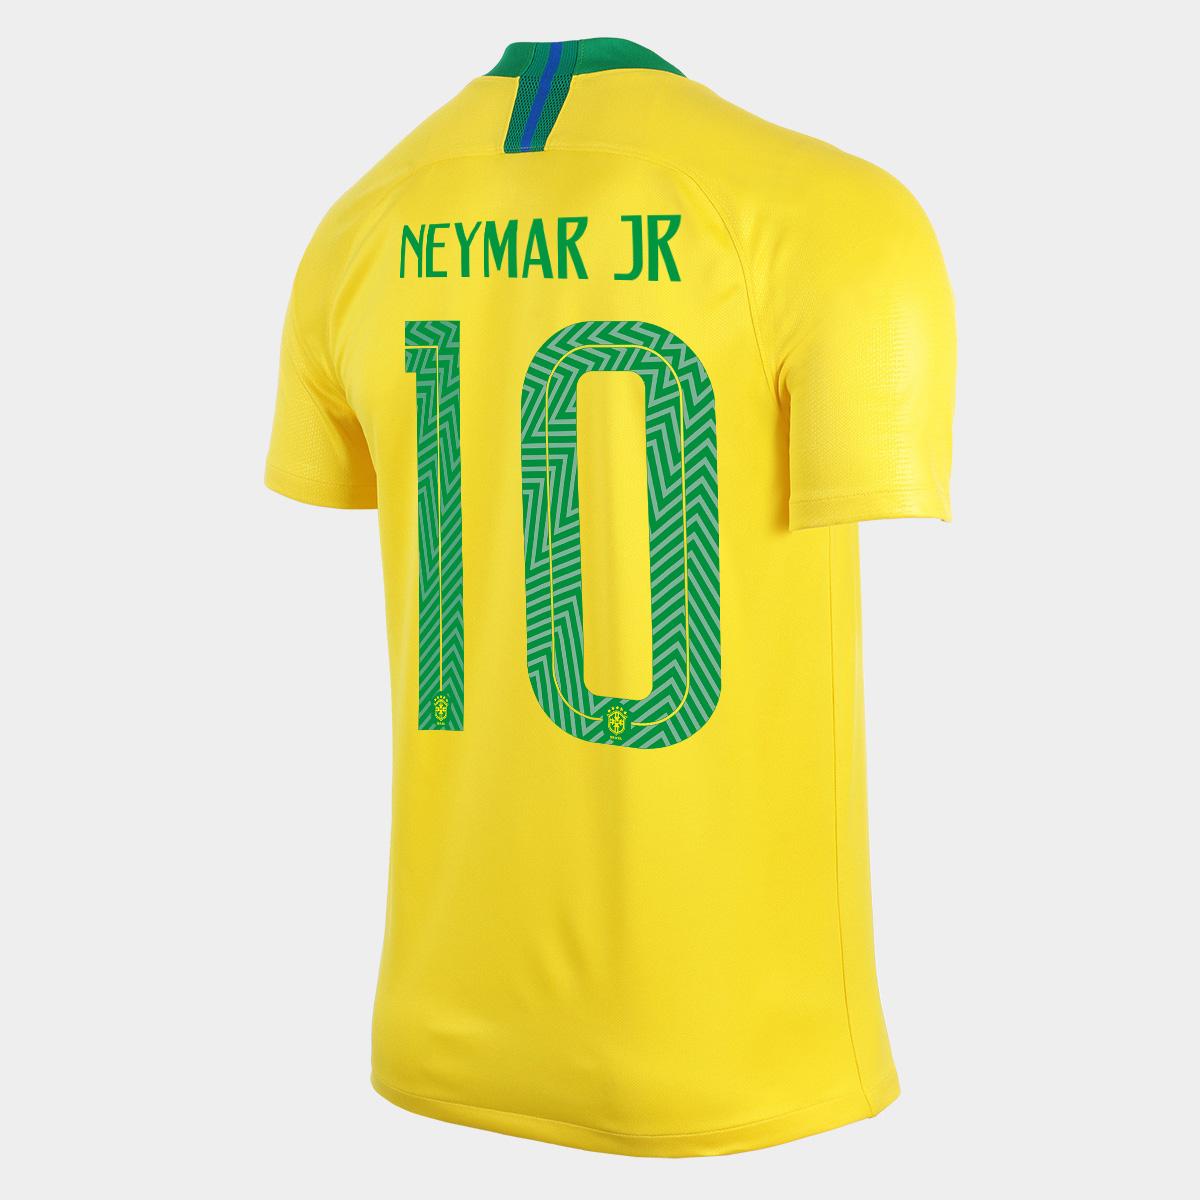 fa7a4a510 Extraordinary Nike Brazil 2018 World Cup Font Revealed - Footy ...